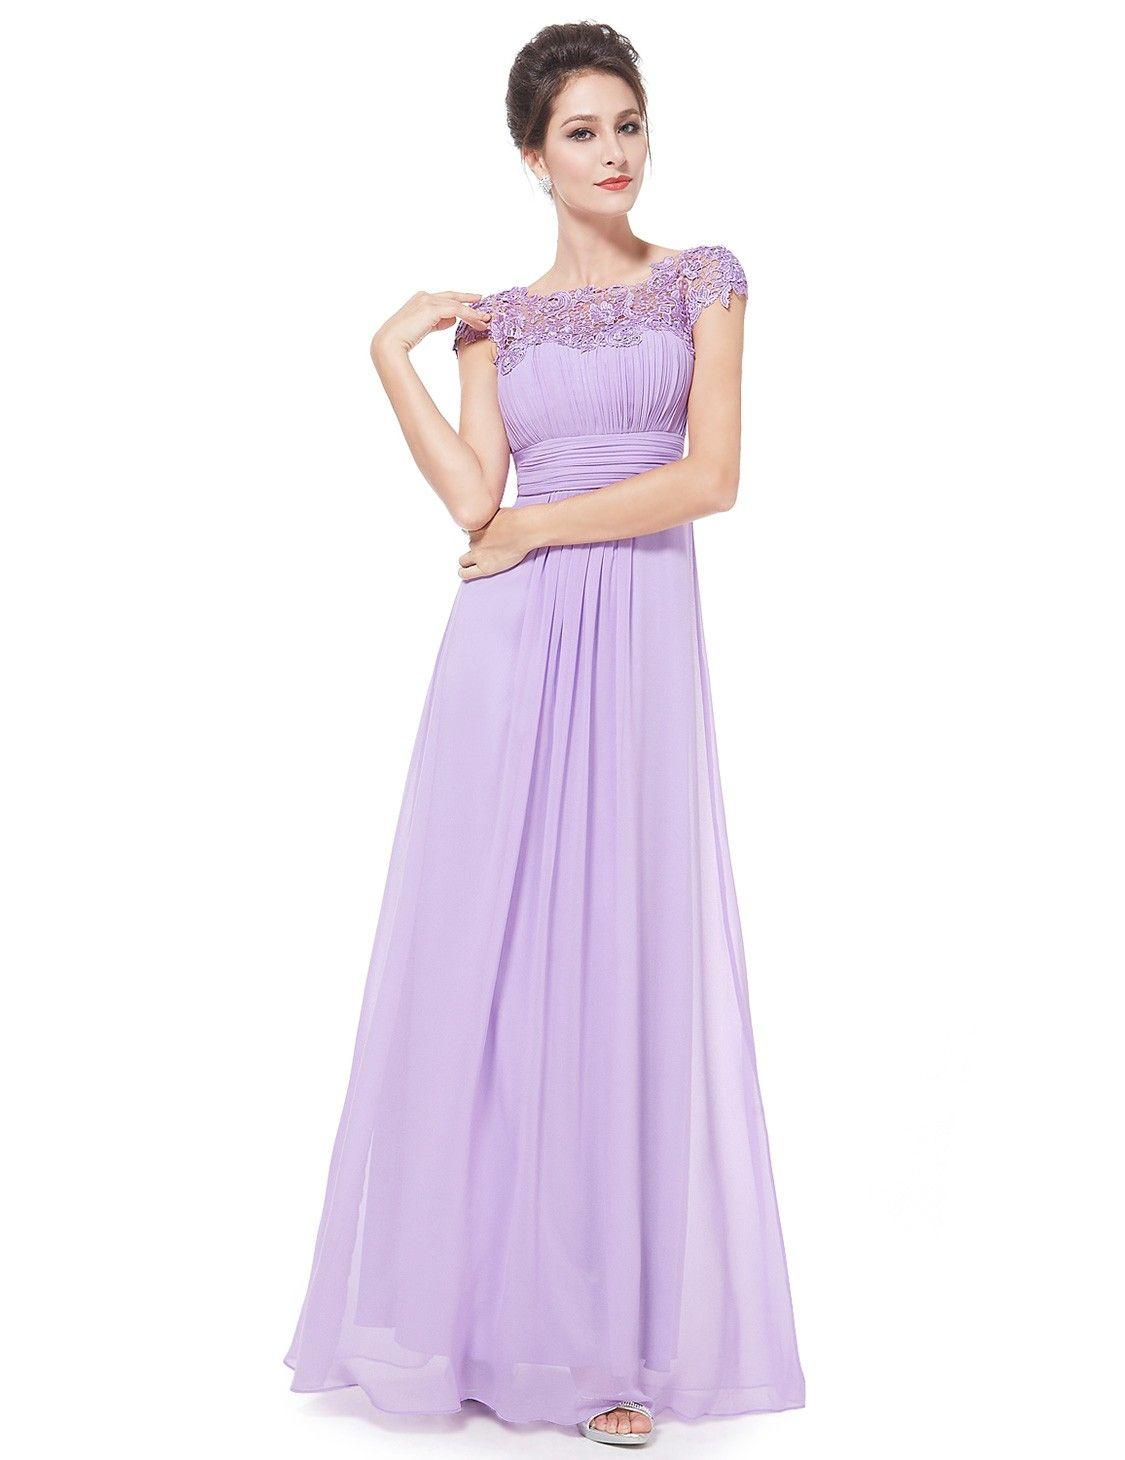 Lace Cap Sleeve Evening Gown | Vestiditos